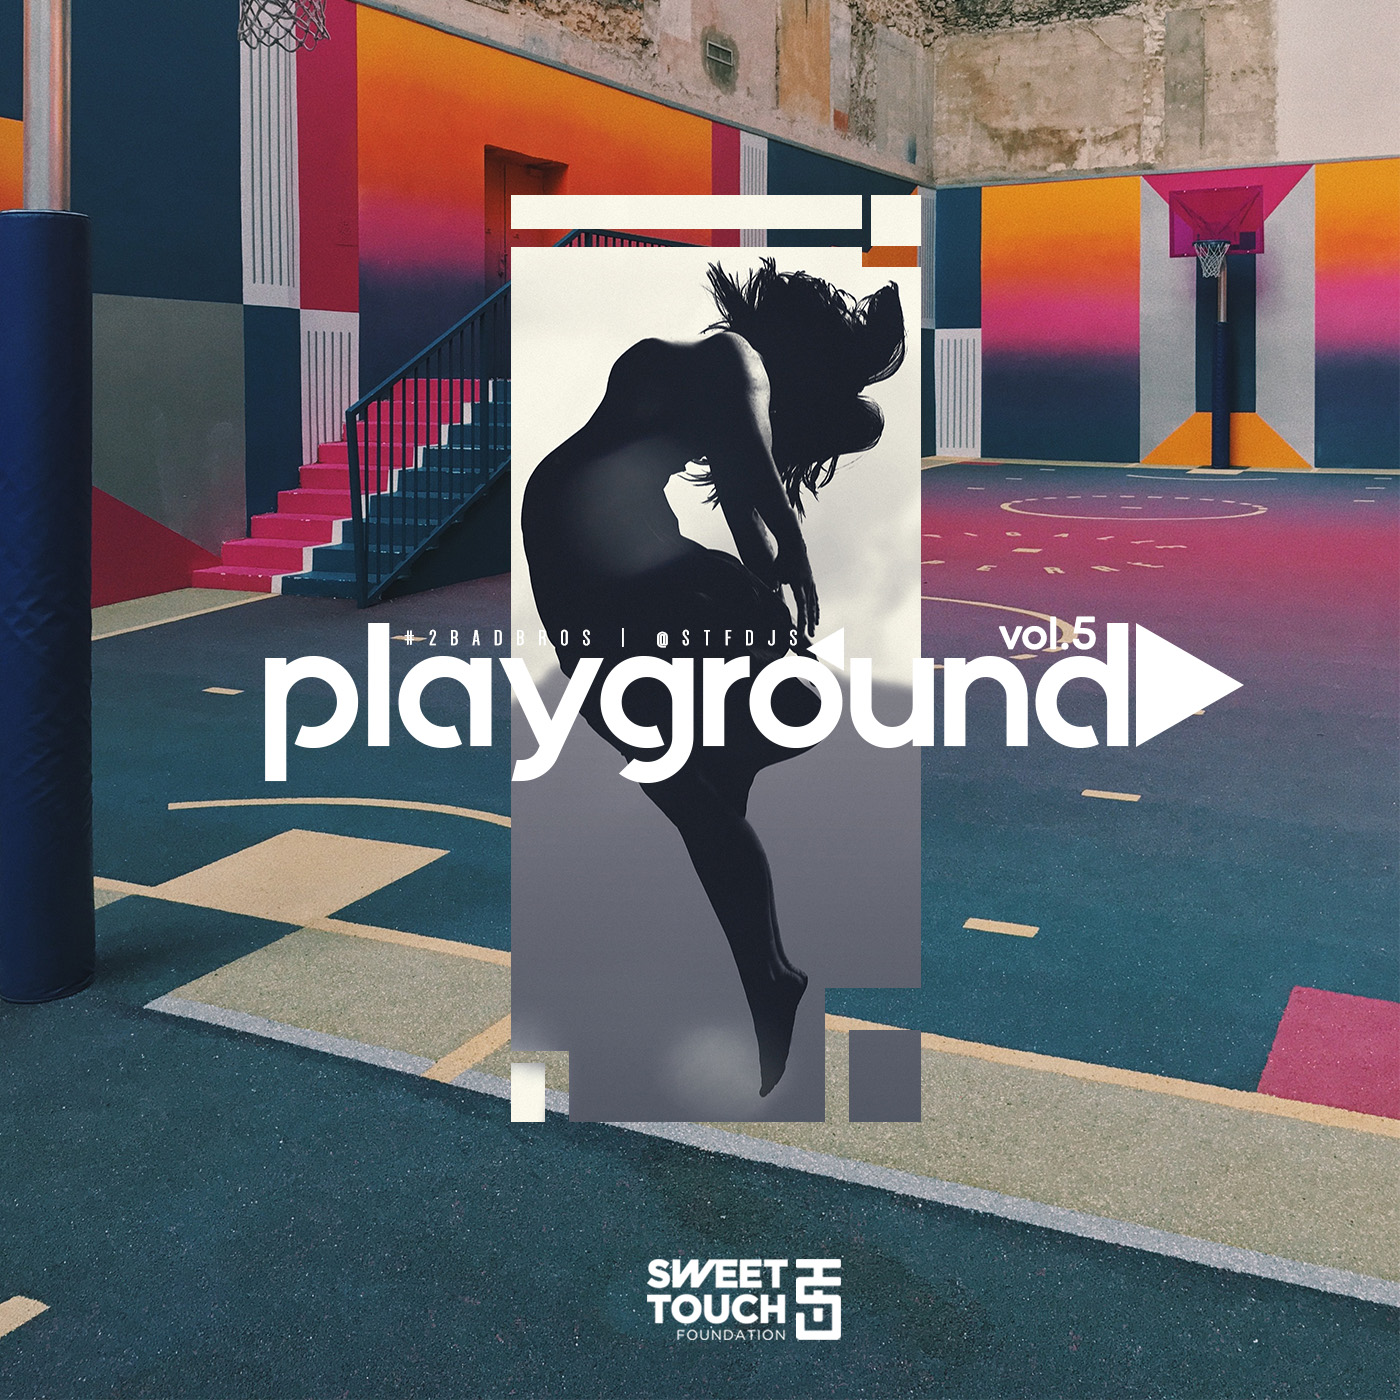 playground_vol5_cover.jpg